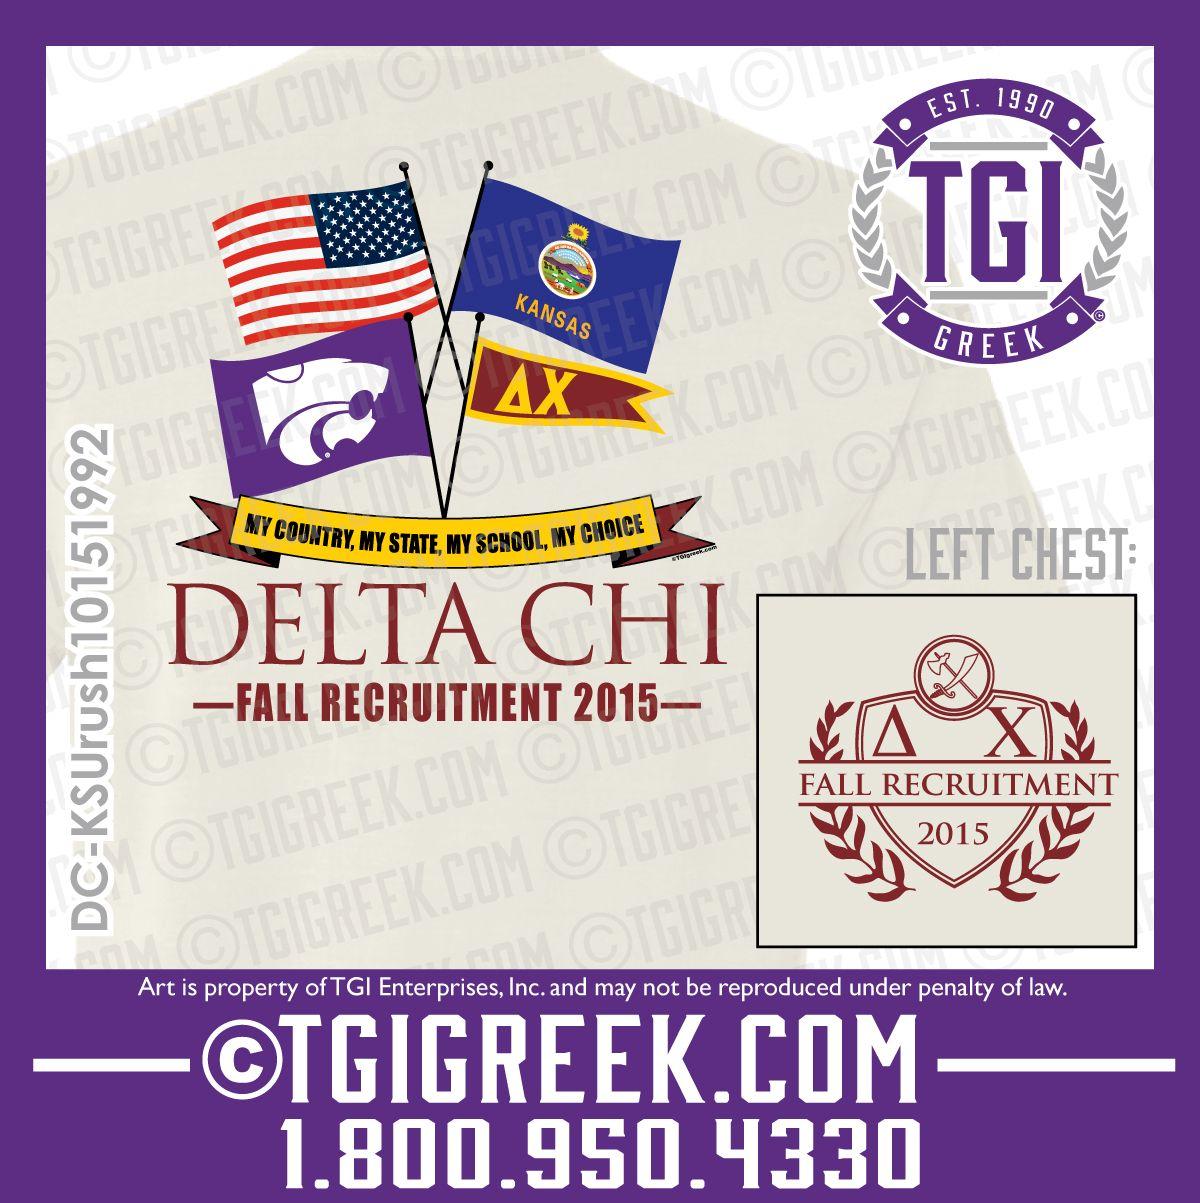 TGI Greek - Delta Chi - Fraternity Recruitment - Greek T-shirts - Comfort Colors - Rush  #tgigreek #deltachi #rush